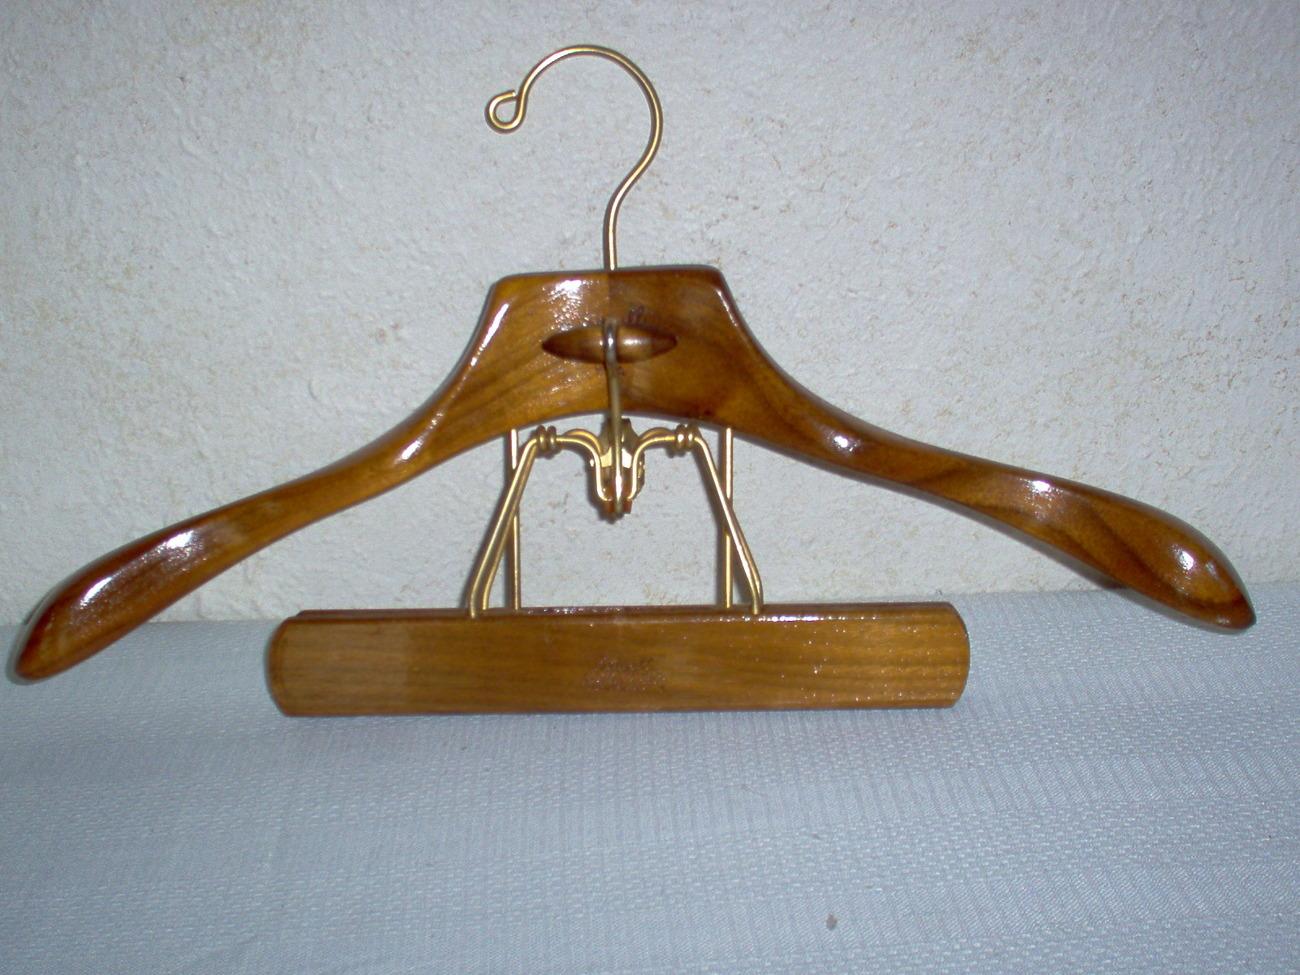 Vintage Setwell Wooden Suit Hanger